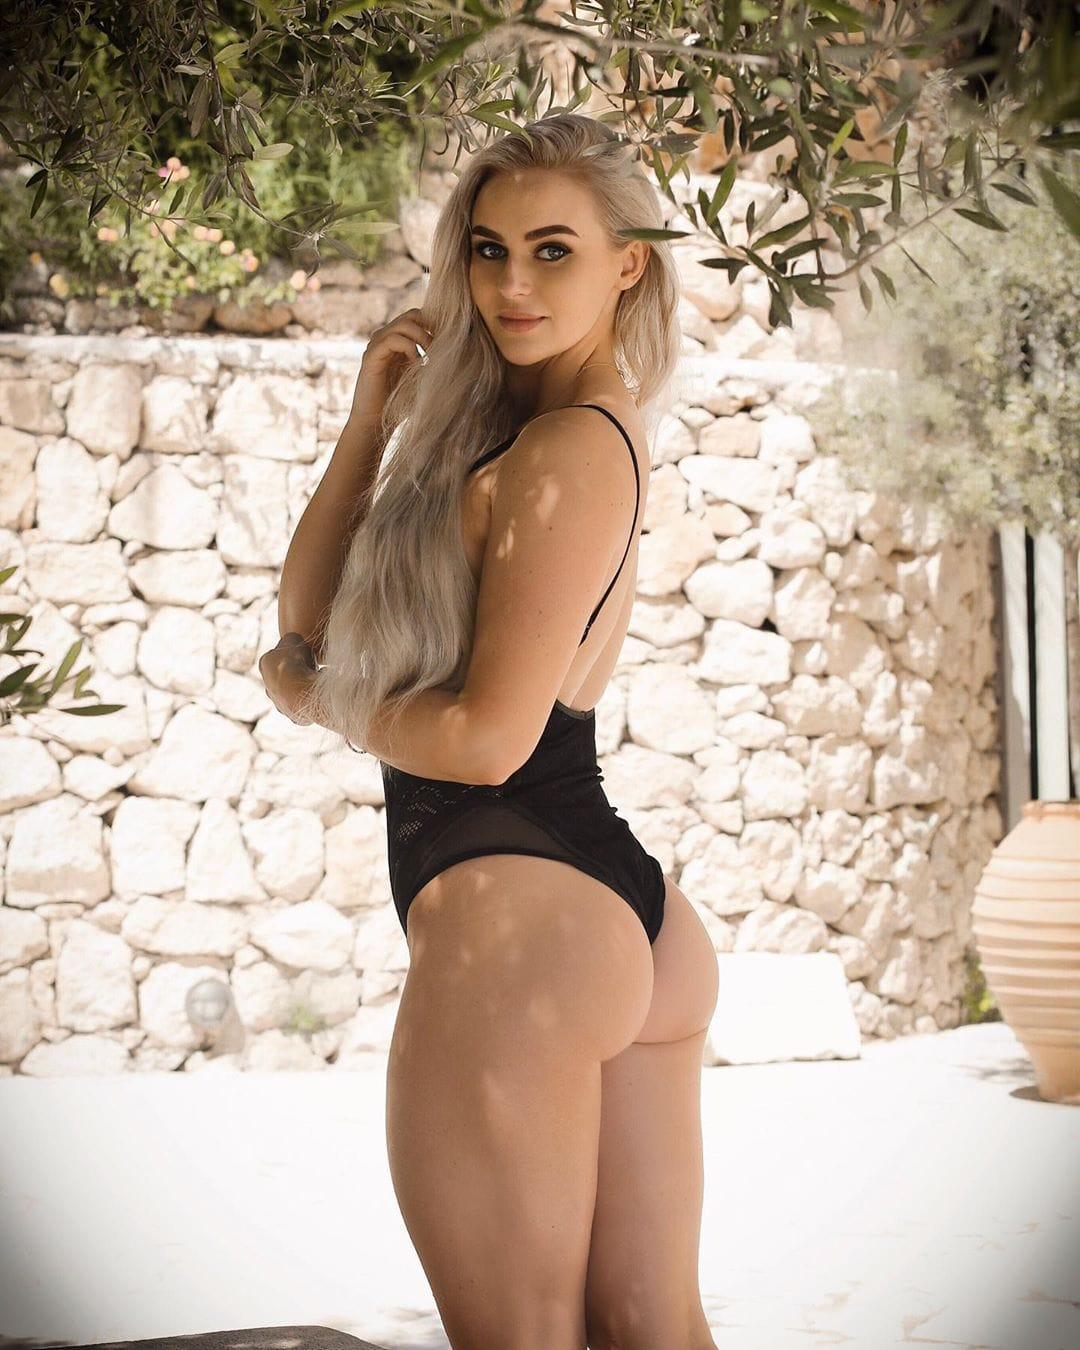 Anna nystrom bikini